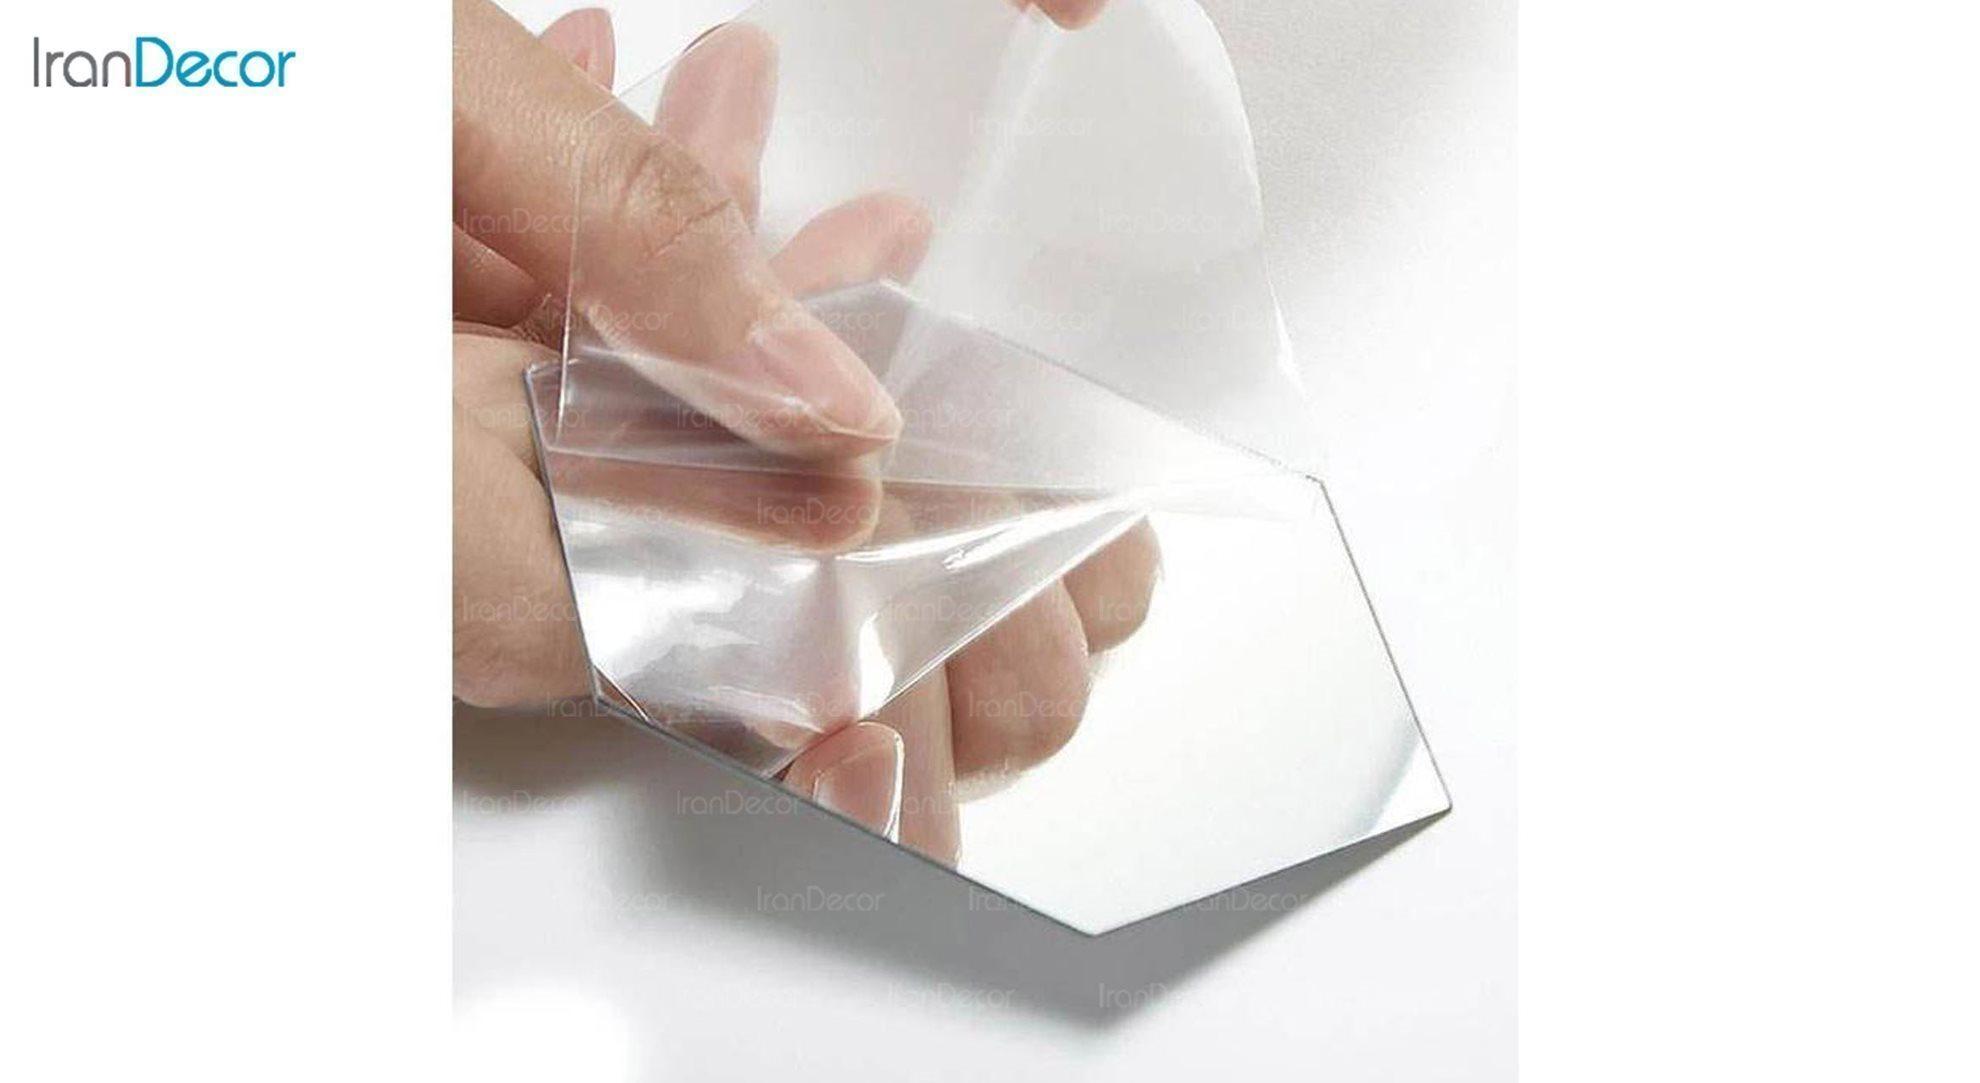 آینه پلکسی گلس طرح اژدها رومادون کد 449 قطر 50 سانتی مترنایلون ضد خش